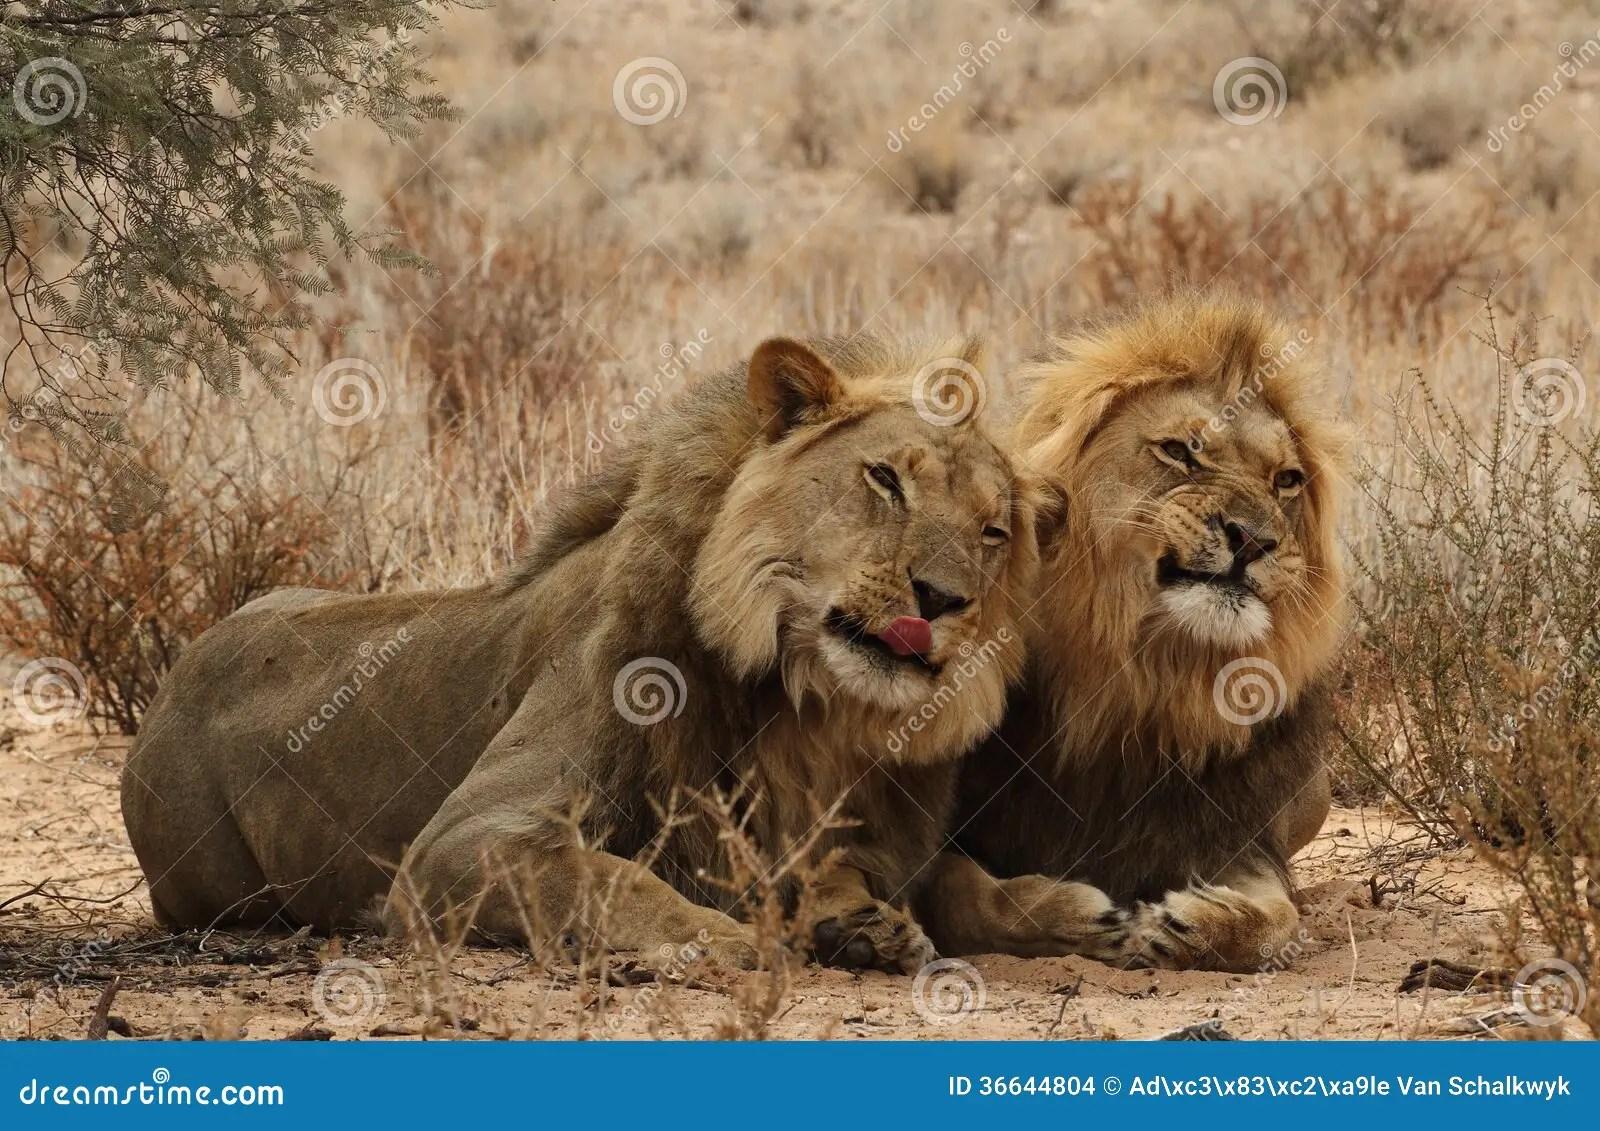 Safari Animal Wallpaper Two Lion Brothers Stock Images Image 36644804